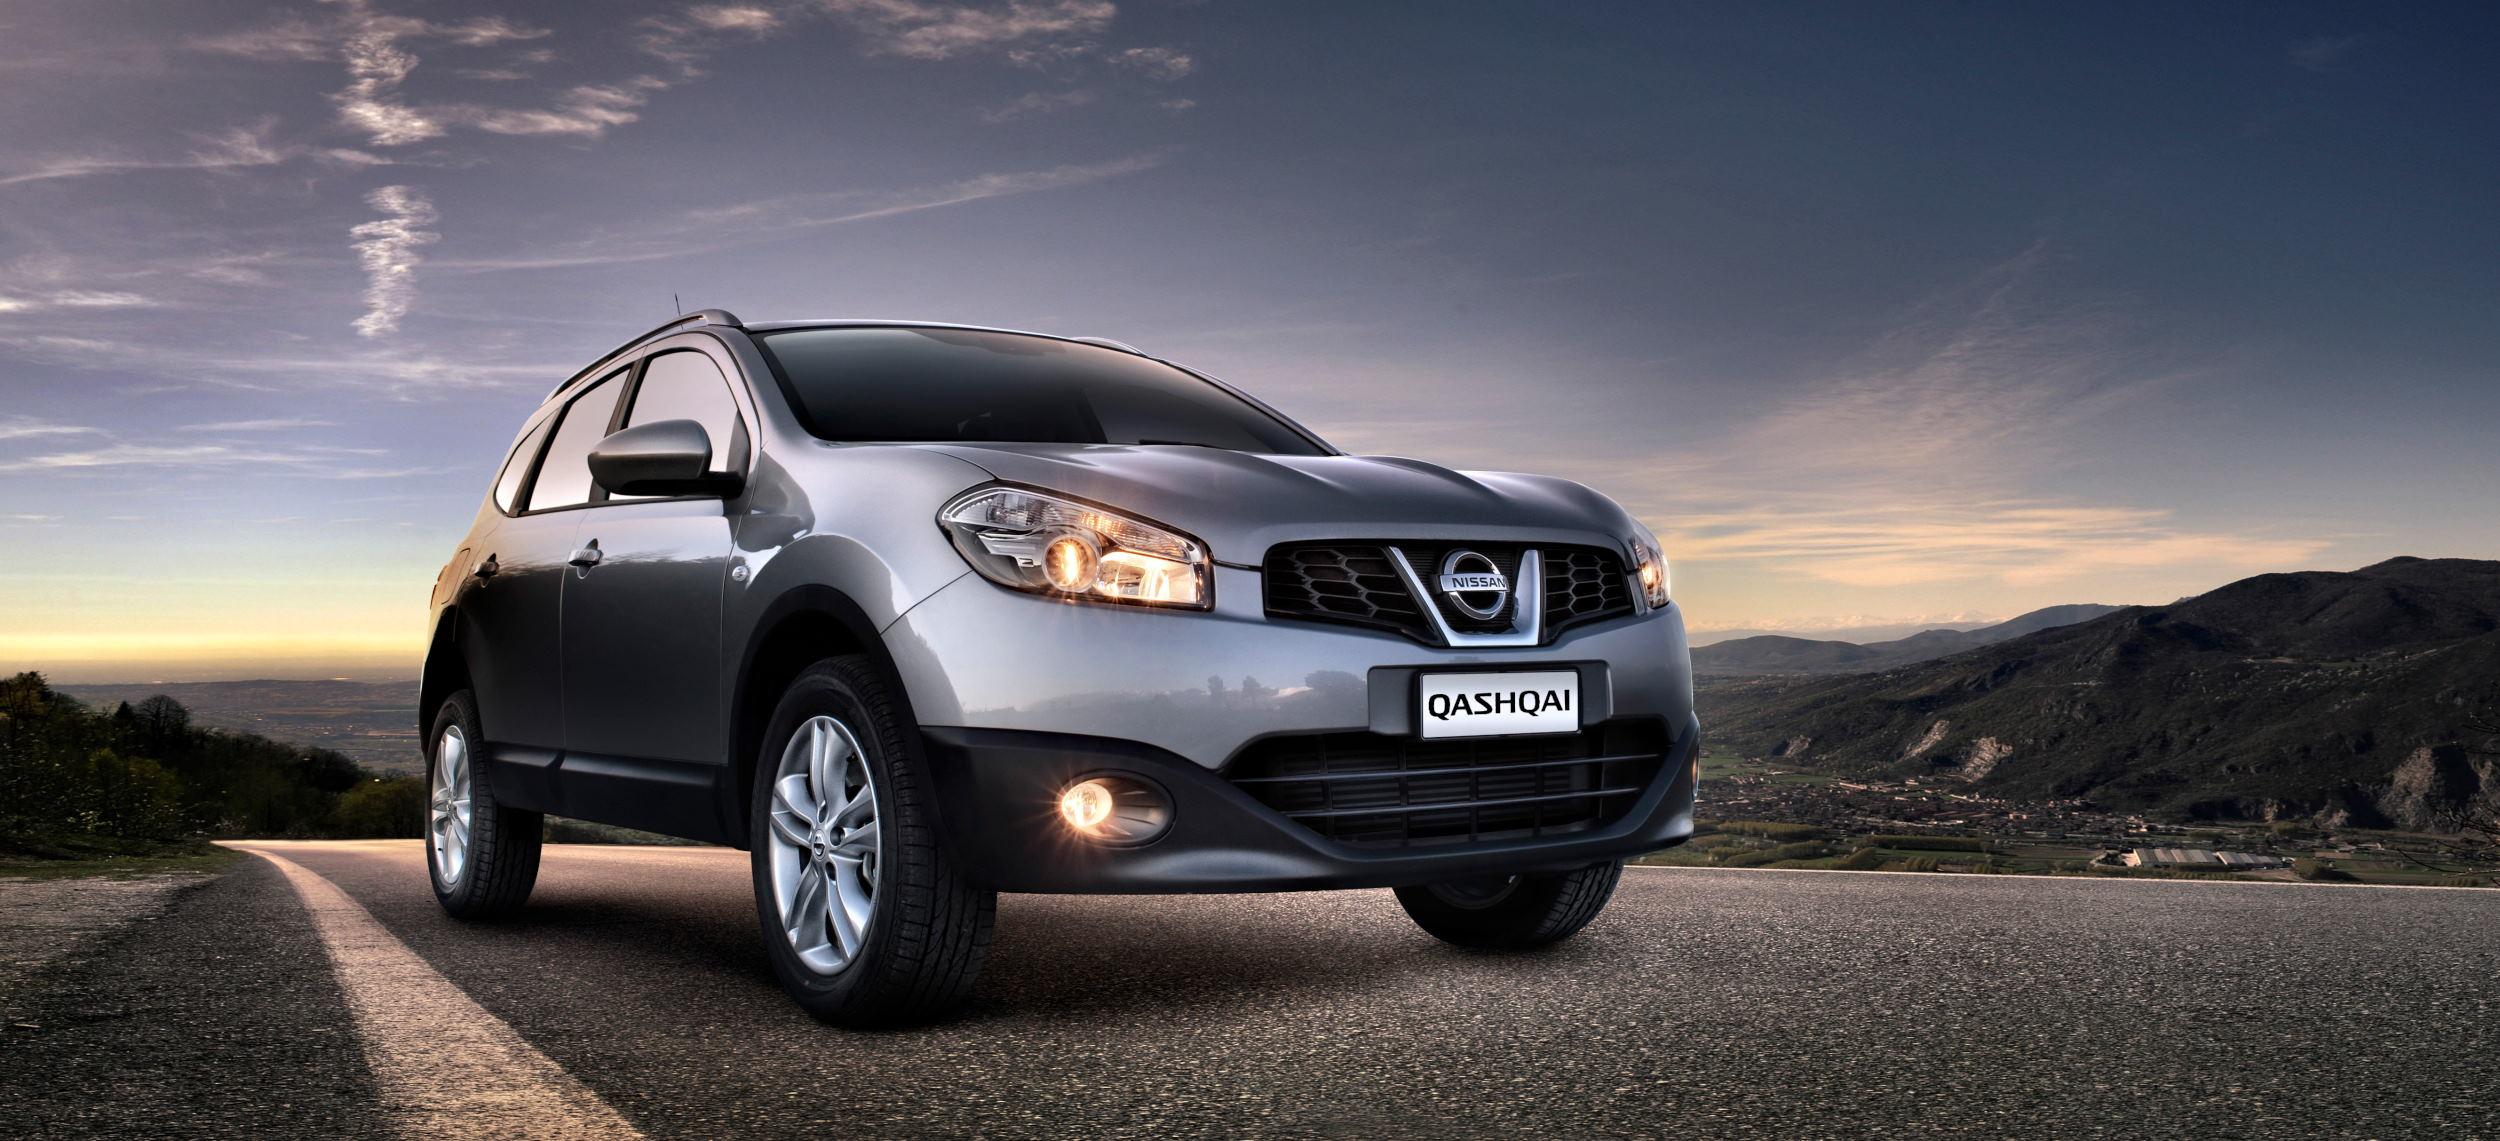 Nissan Qashqai- Self promotion